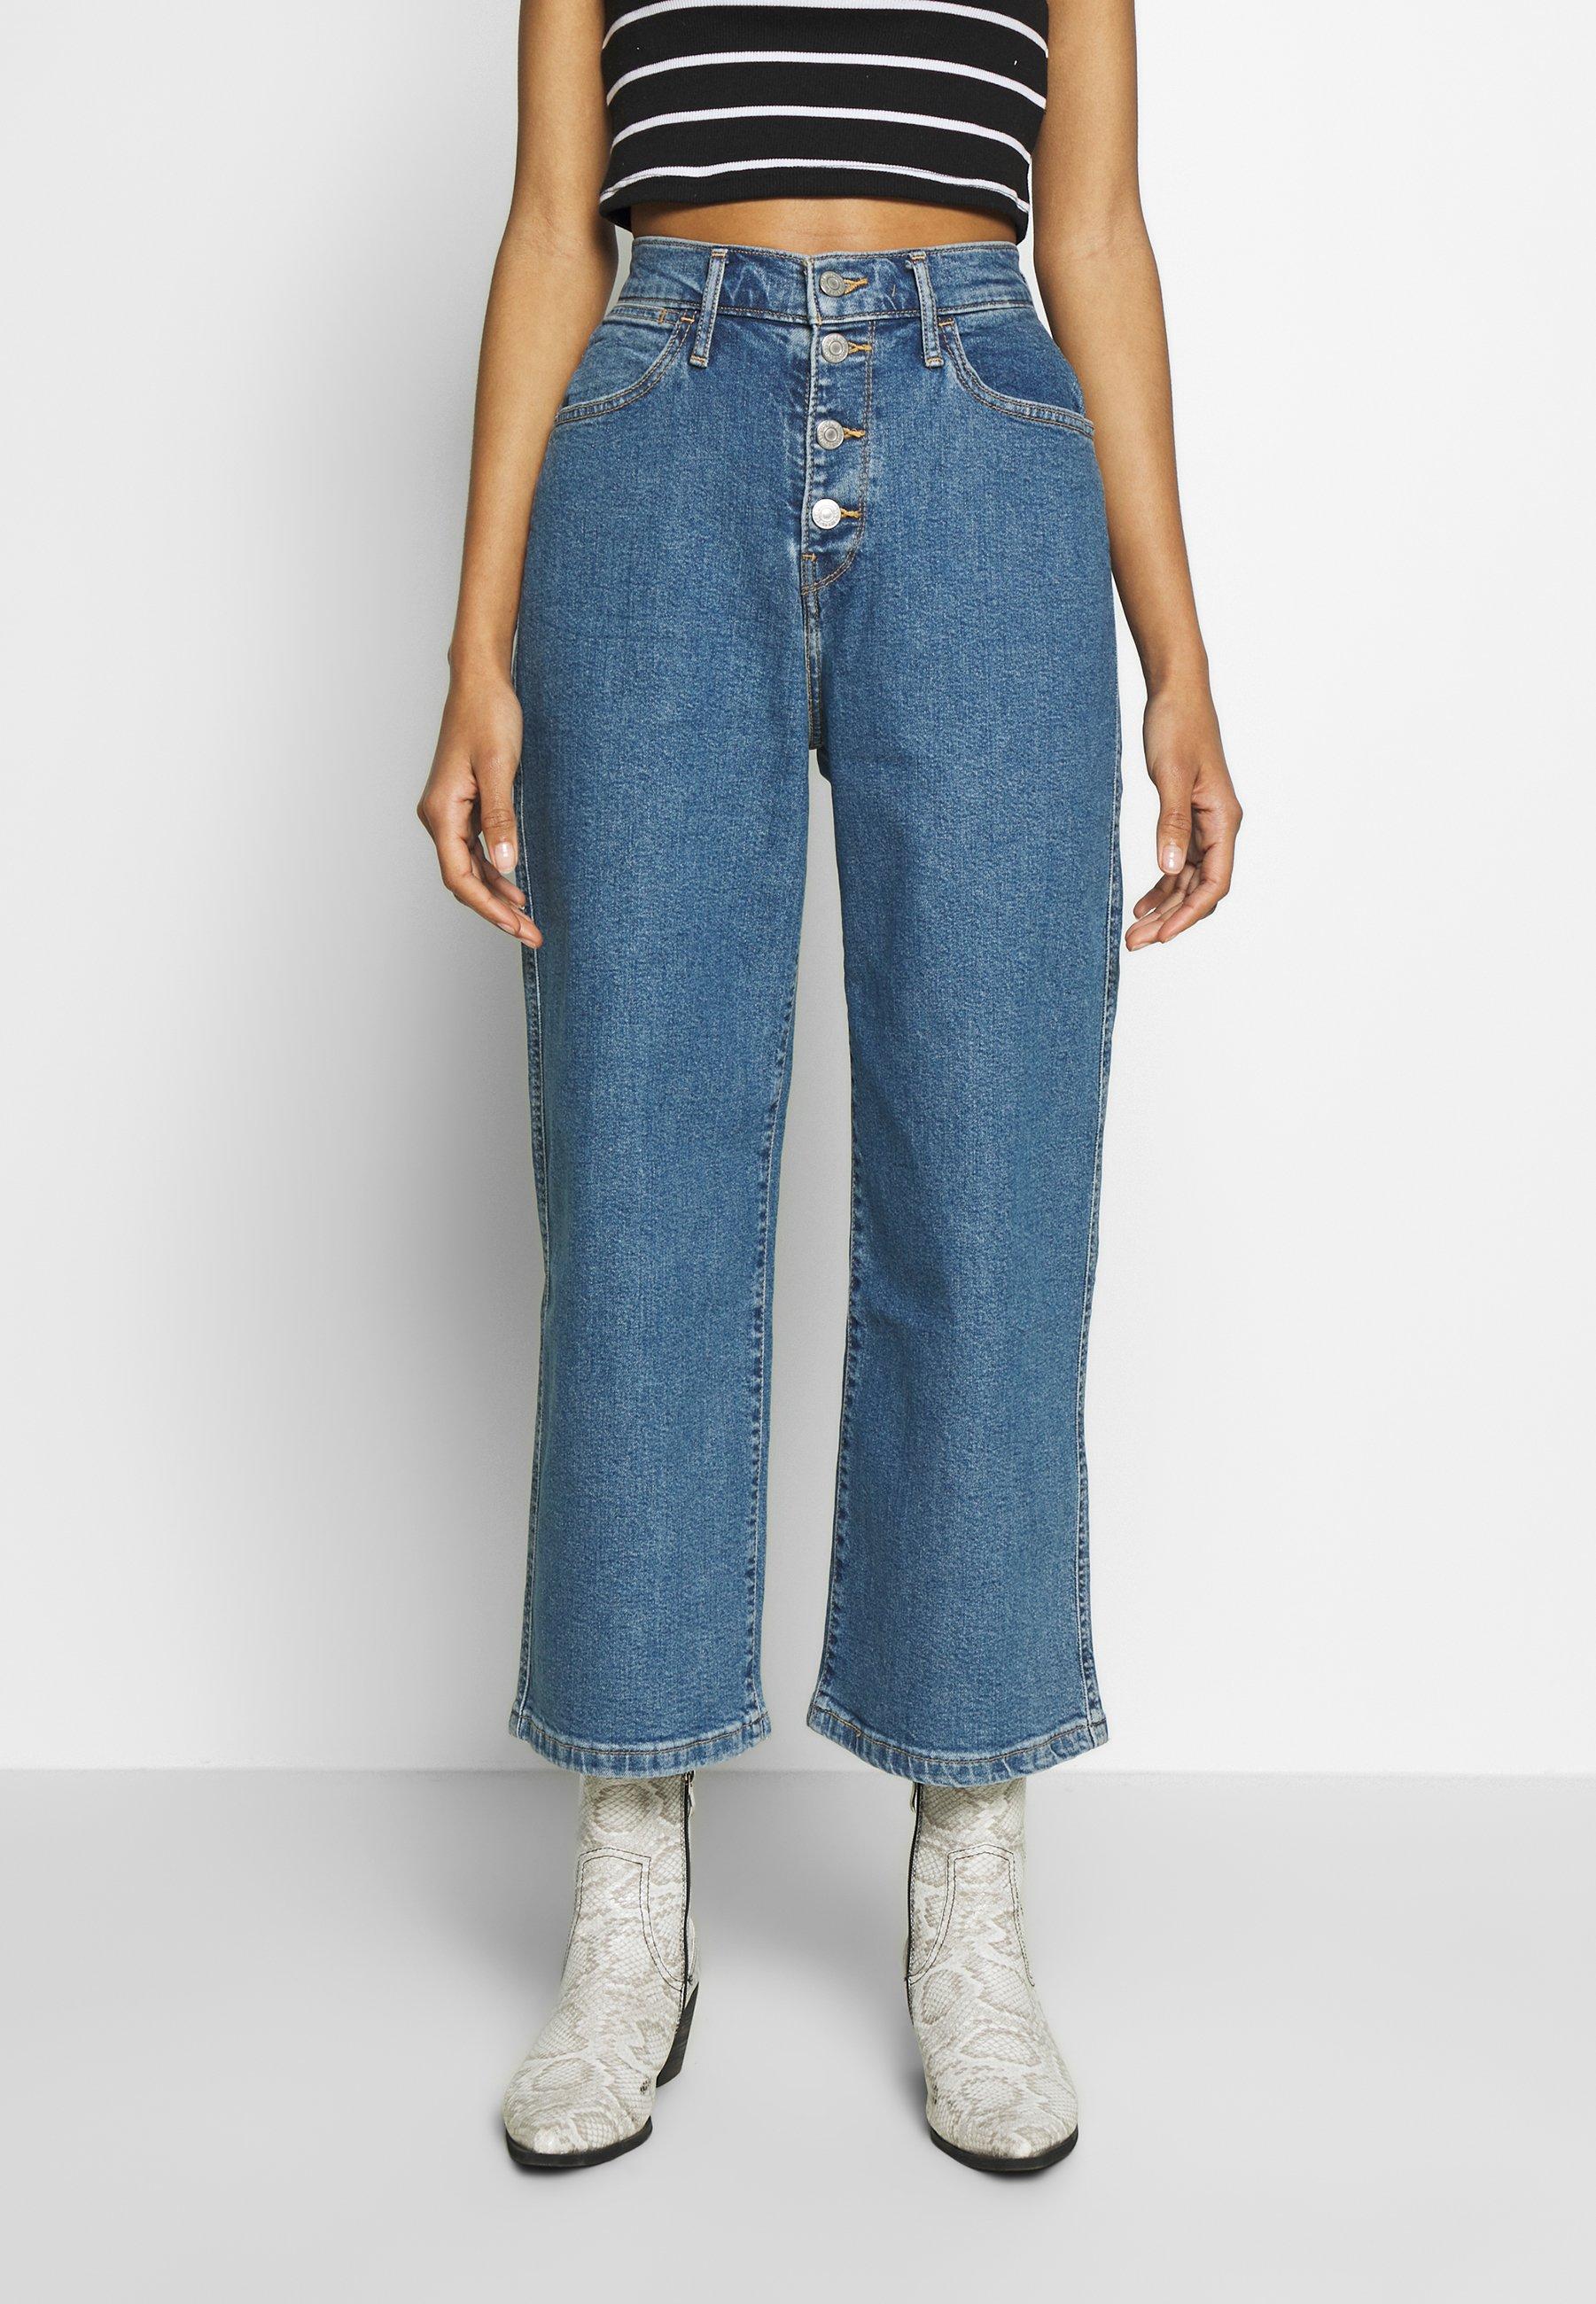 Pantalones vaqueros Levi's® de mujer | Comprar jeans online